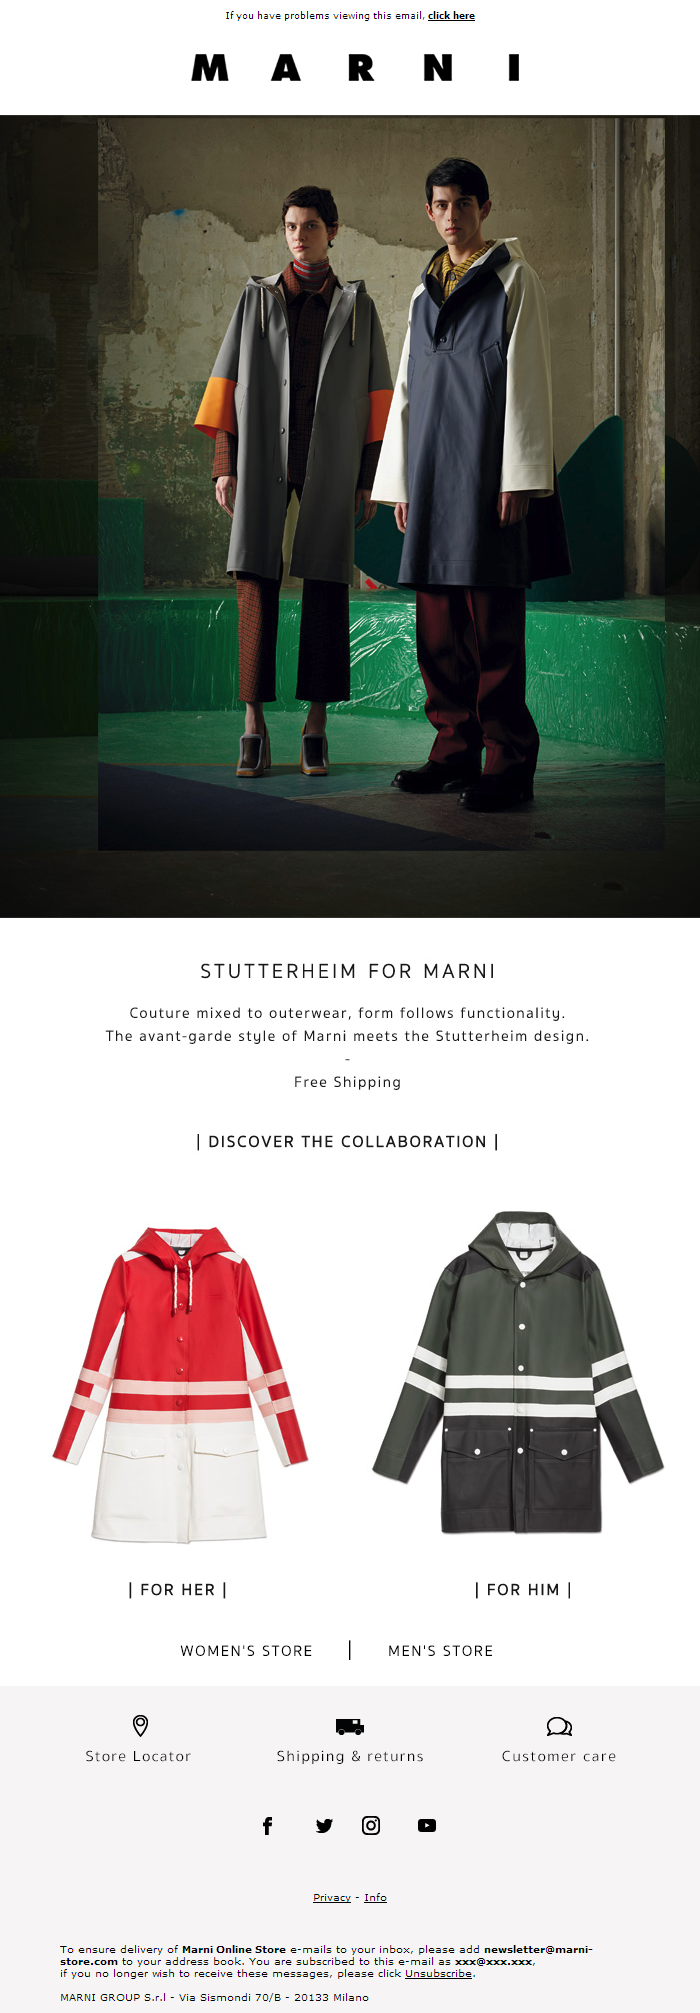 Stutterheim for Marni | Free shipping